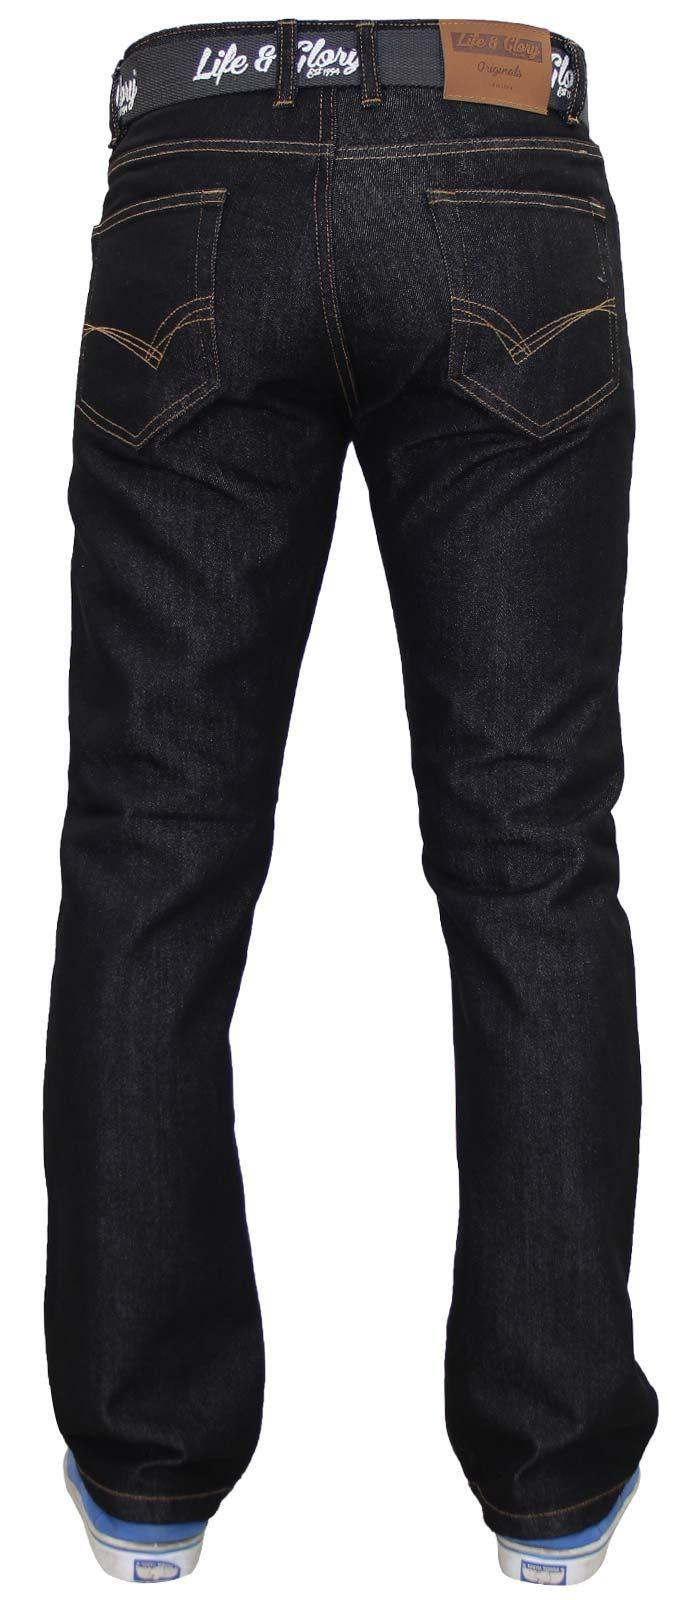 Men-Regular-Fit-Jeans-Denim-Button-Fly-Straight-Leg-Trouser-Pant-With-Free-Belt thumbnail 6